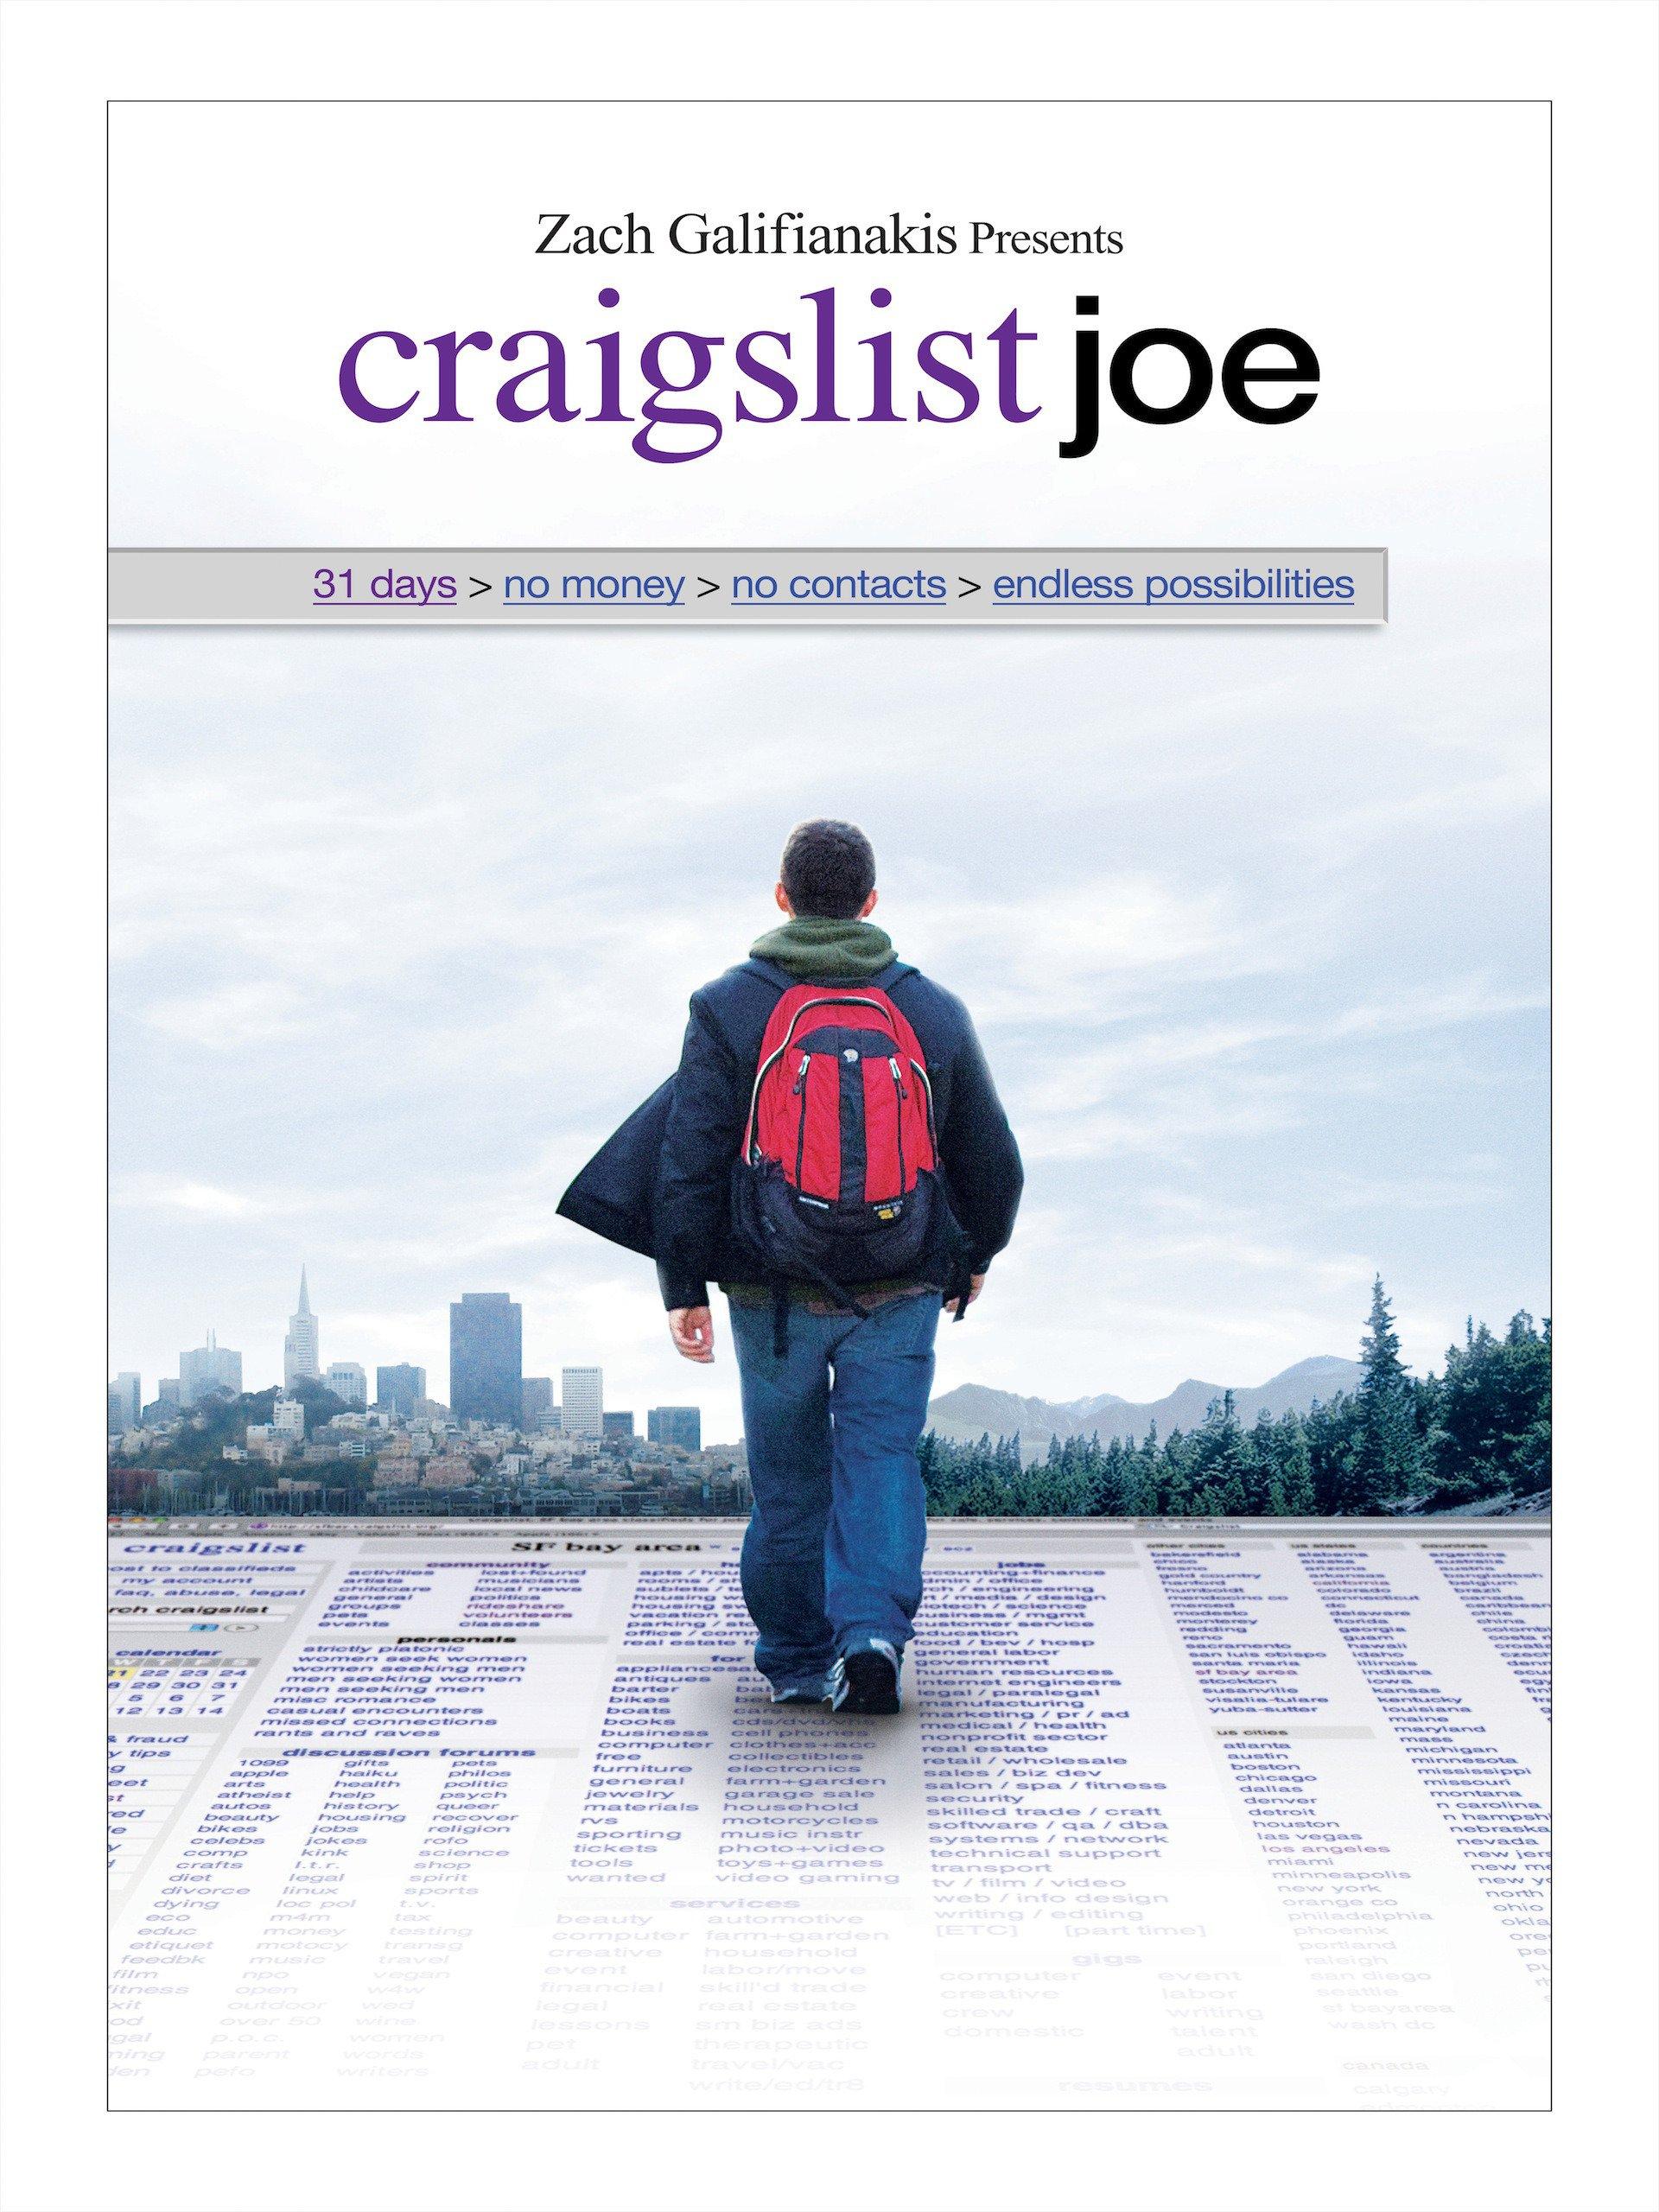 Amazon.com: Craigslist Joe: Joseph Garner, Kristos Andrews, Zach  Galifinakis, Uday Sehgal: Amazon Digital Services LLC